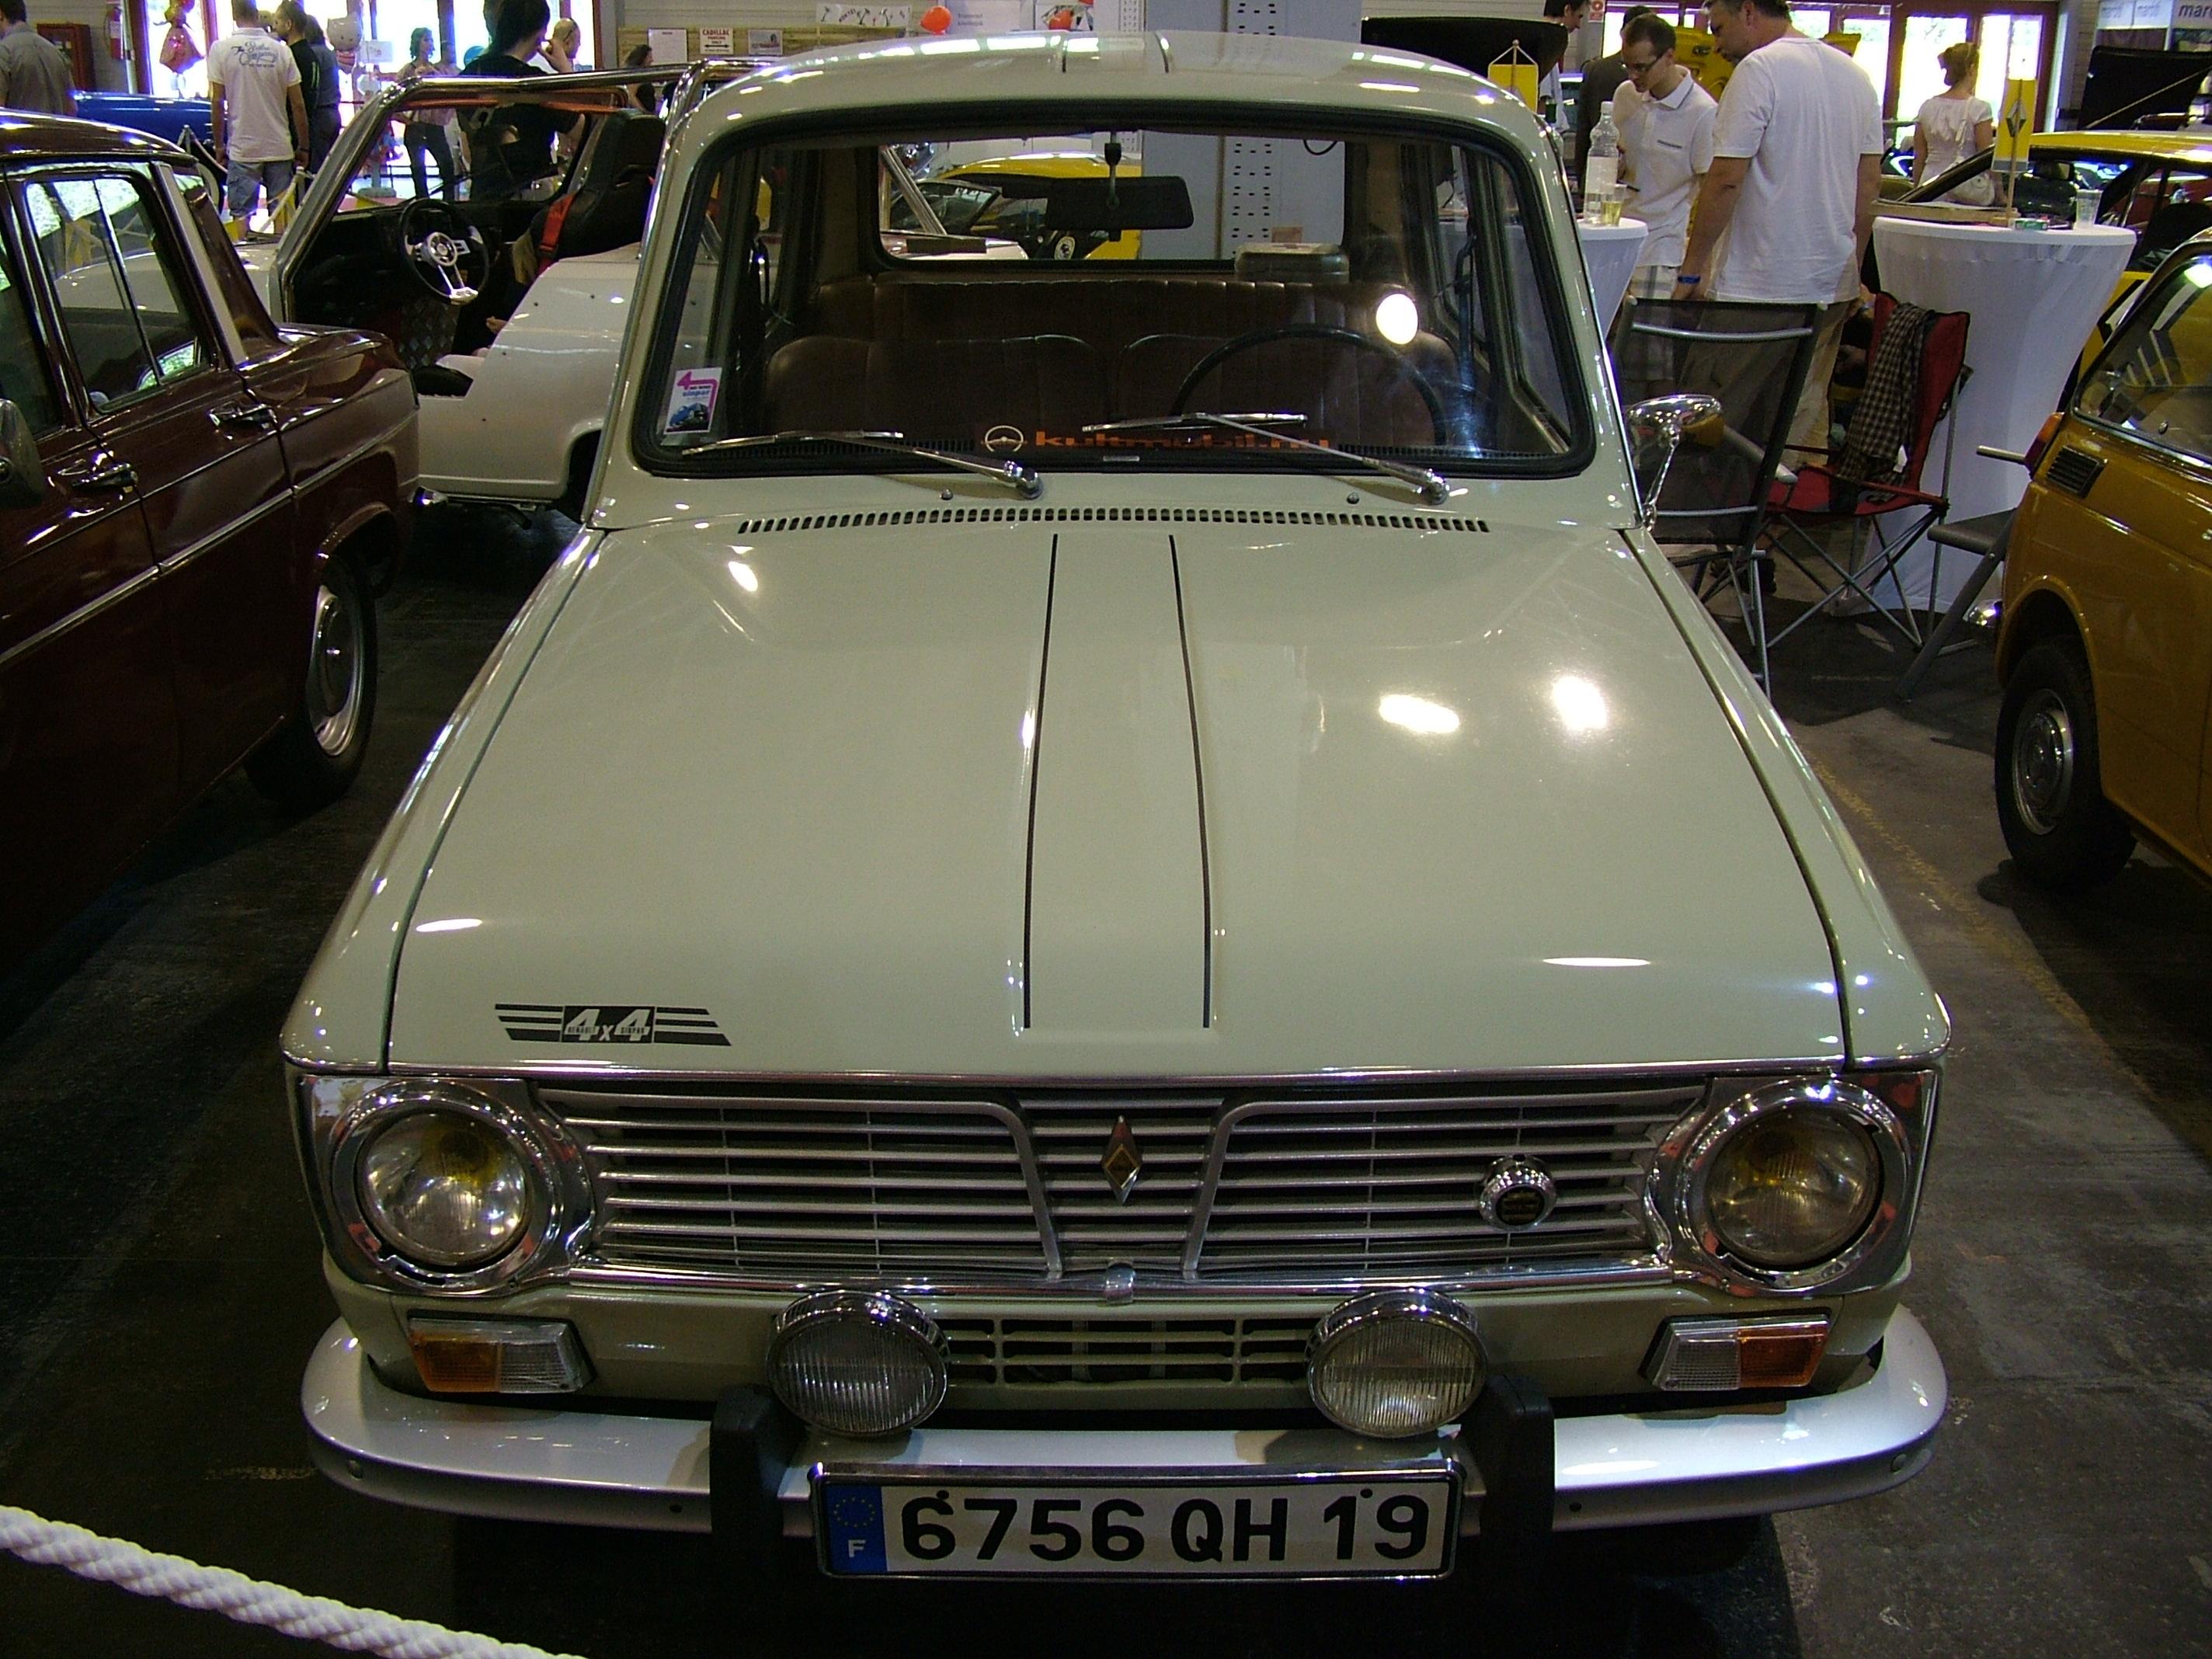 File:Renault R-1181 4x4 Sinpar, 1974 (7126256771).jpg